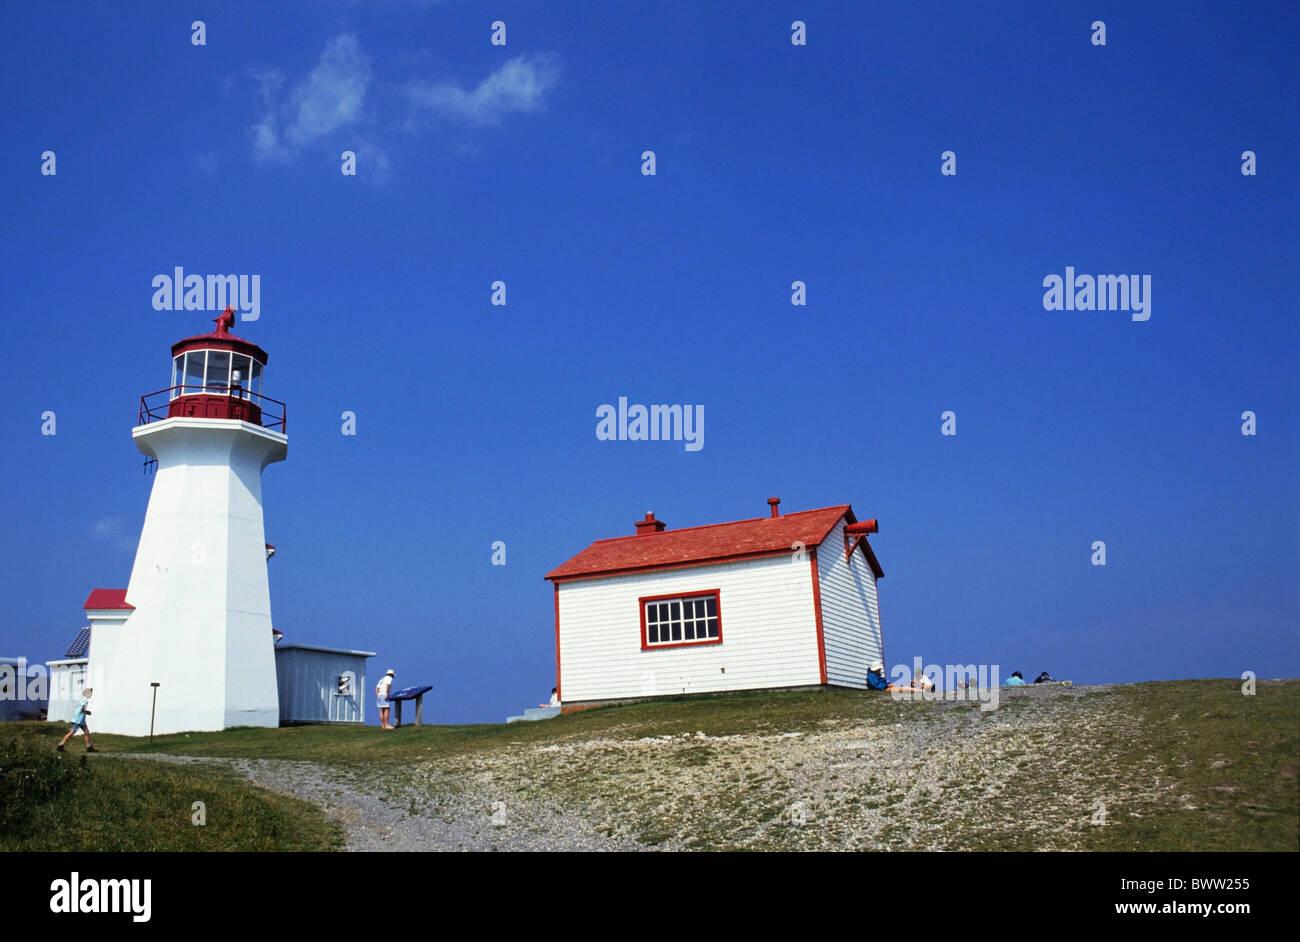 Tourists visiting the lighthouse at Forillon National Park, Gaspé Peninsula, Canada. - Stock Image